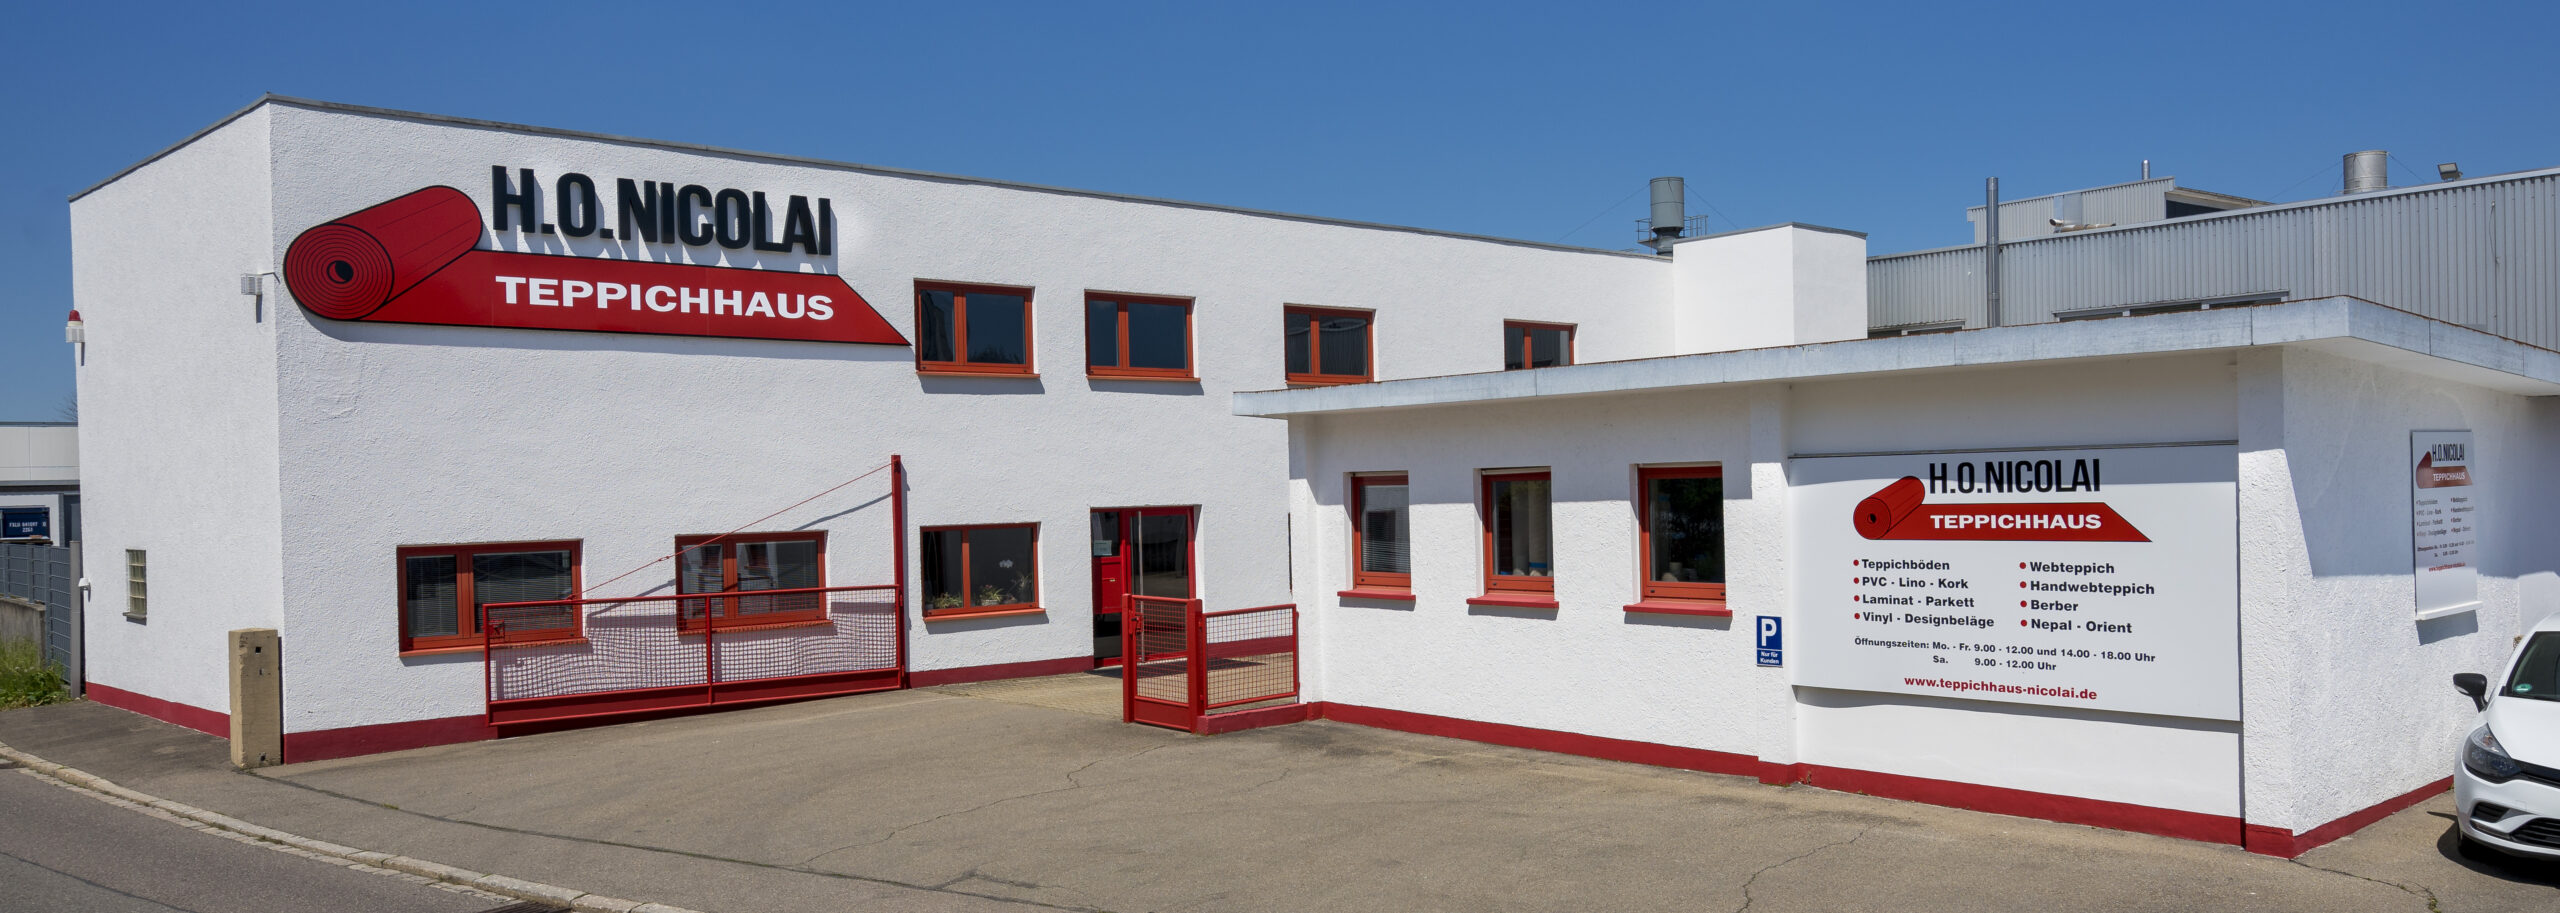 Firmengebäude Teppichhaus Nicolai